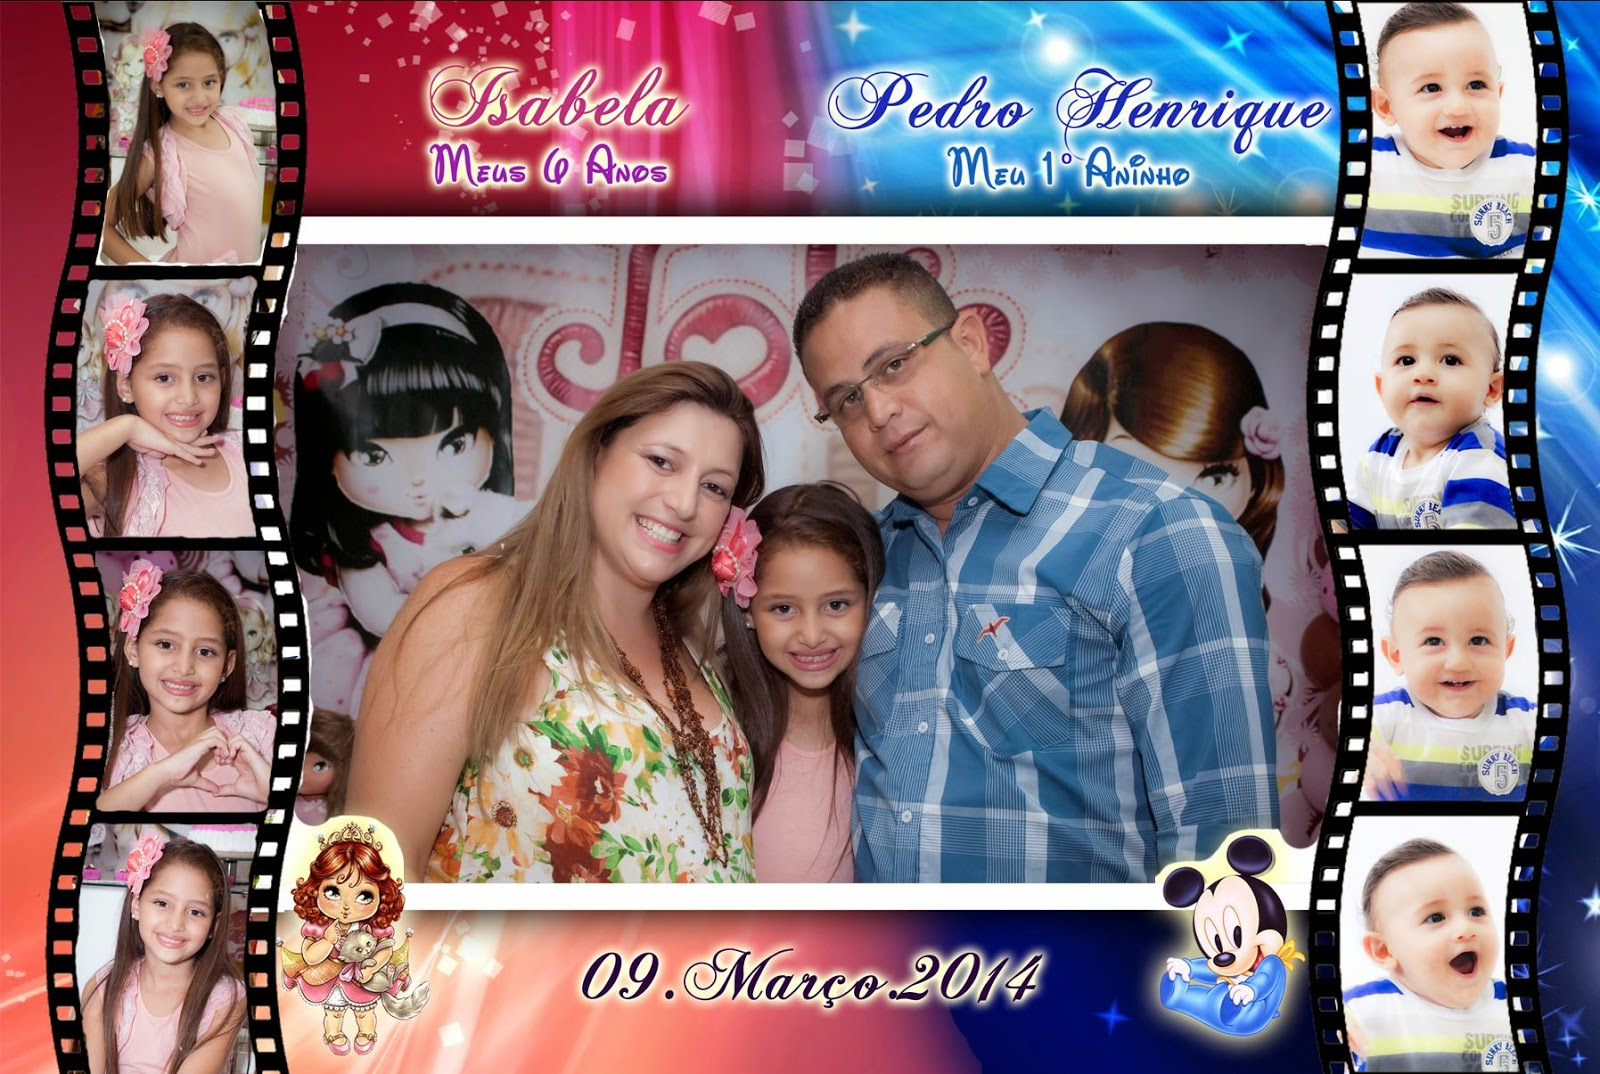 http://fotos-lembranca.blogspot.com.br/2014/03/20140309-pedro-e-isabela-baby-disney.html